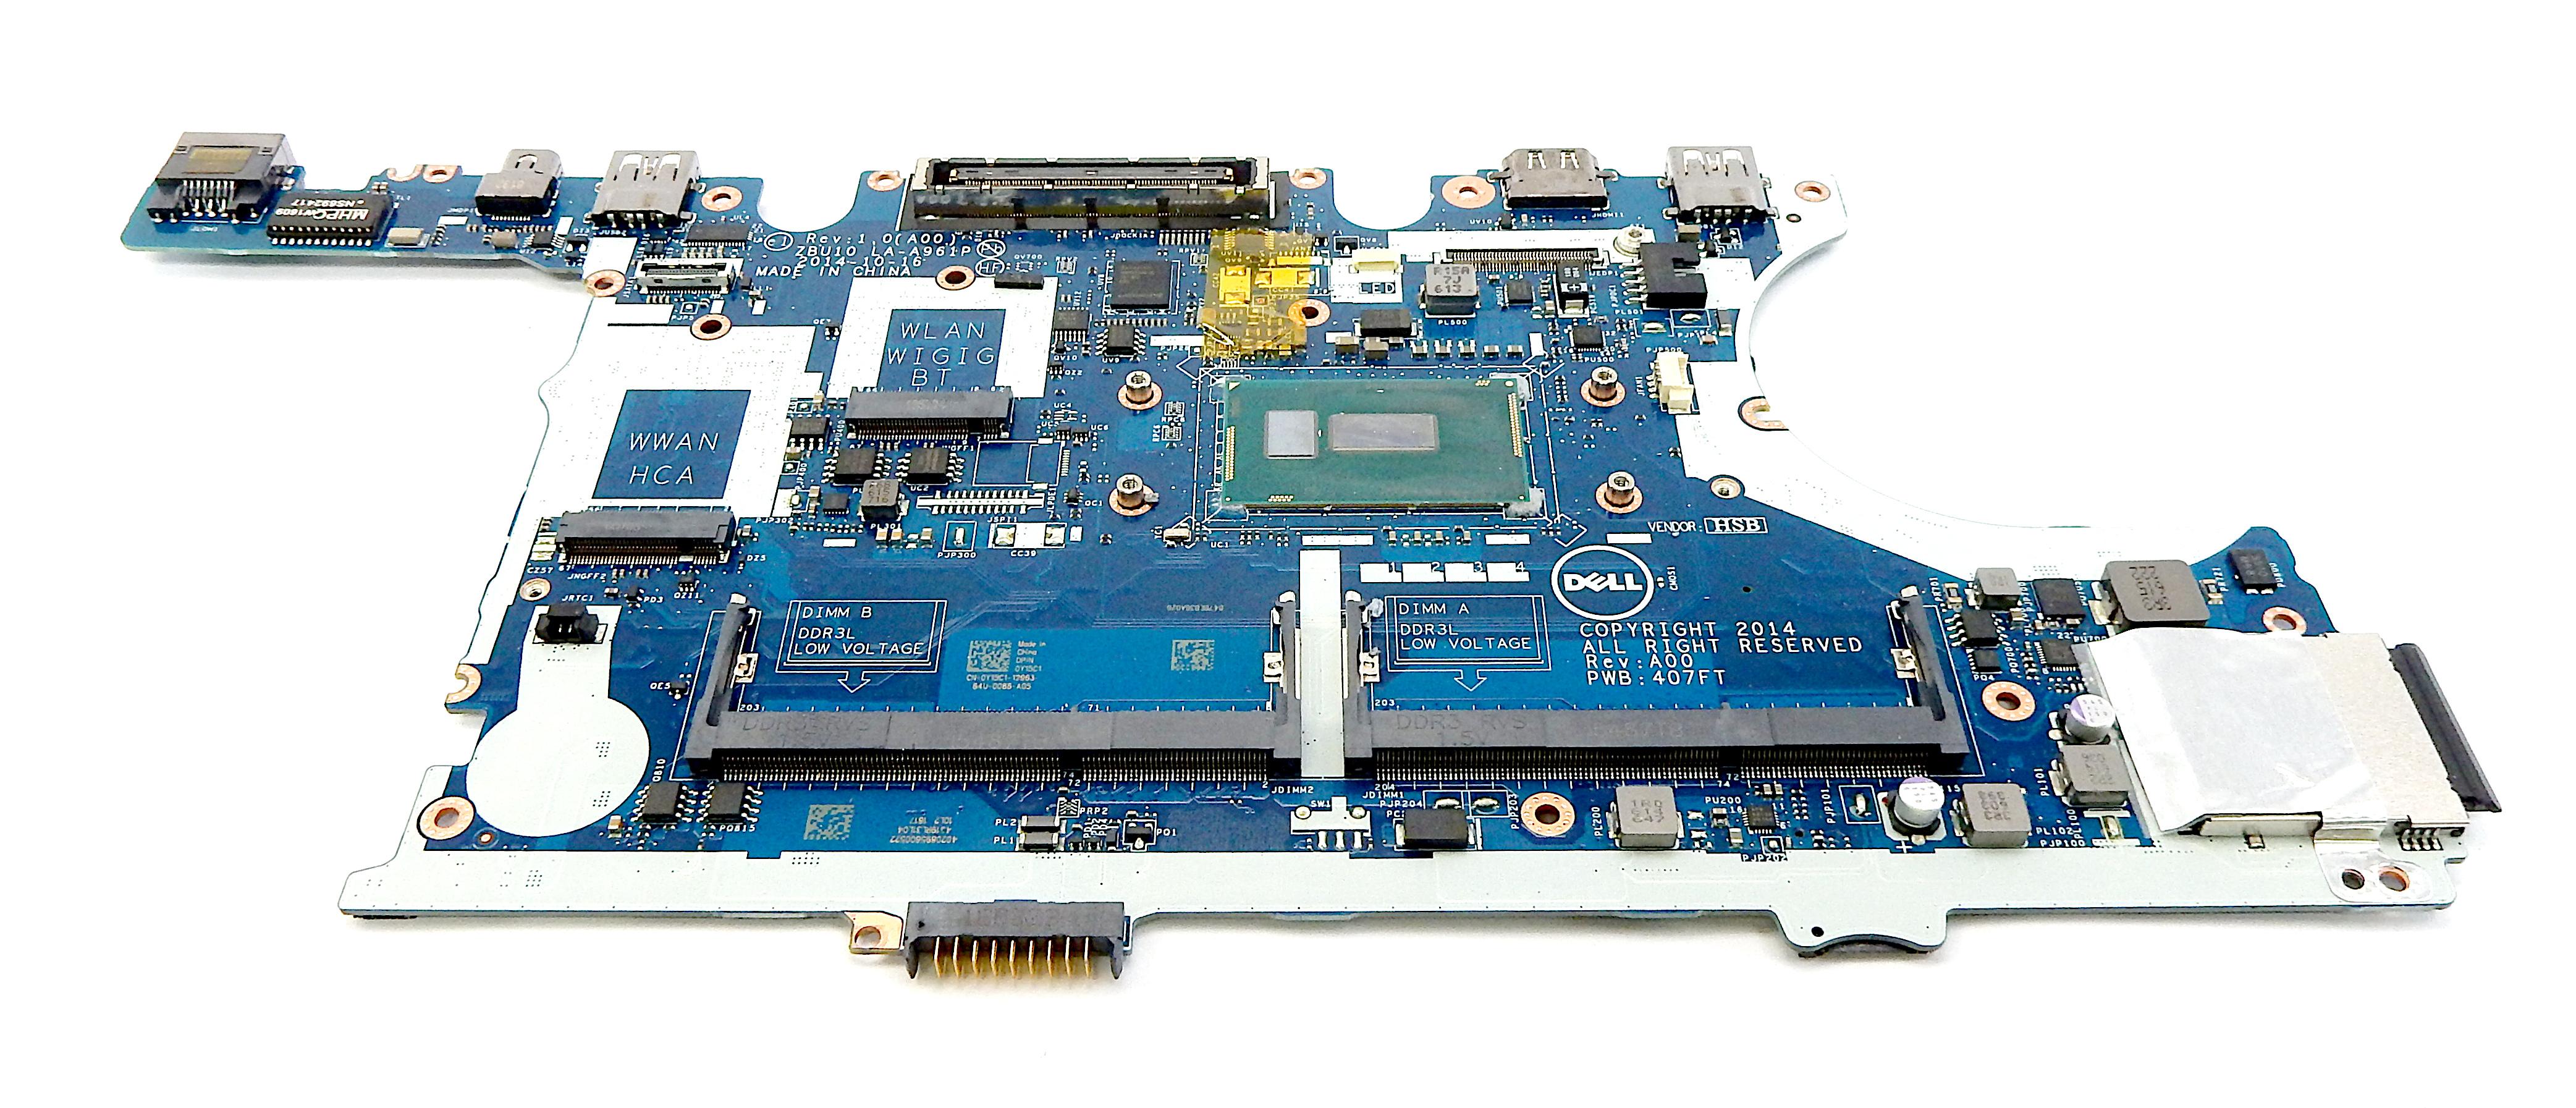 Dell Y15C1 Latitude E7450 with i7-5600U Laptop Motherboard